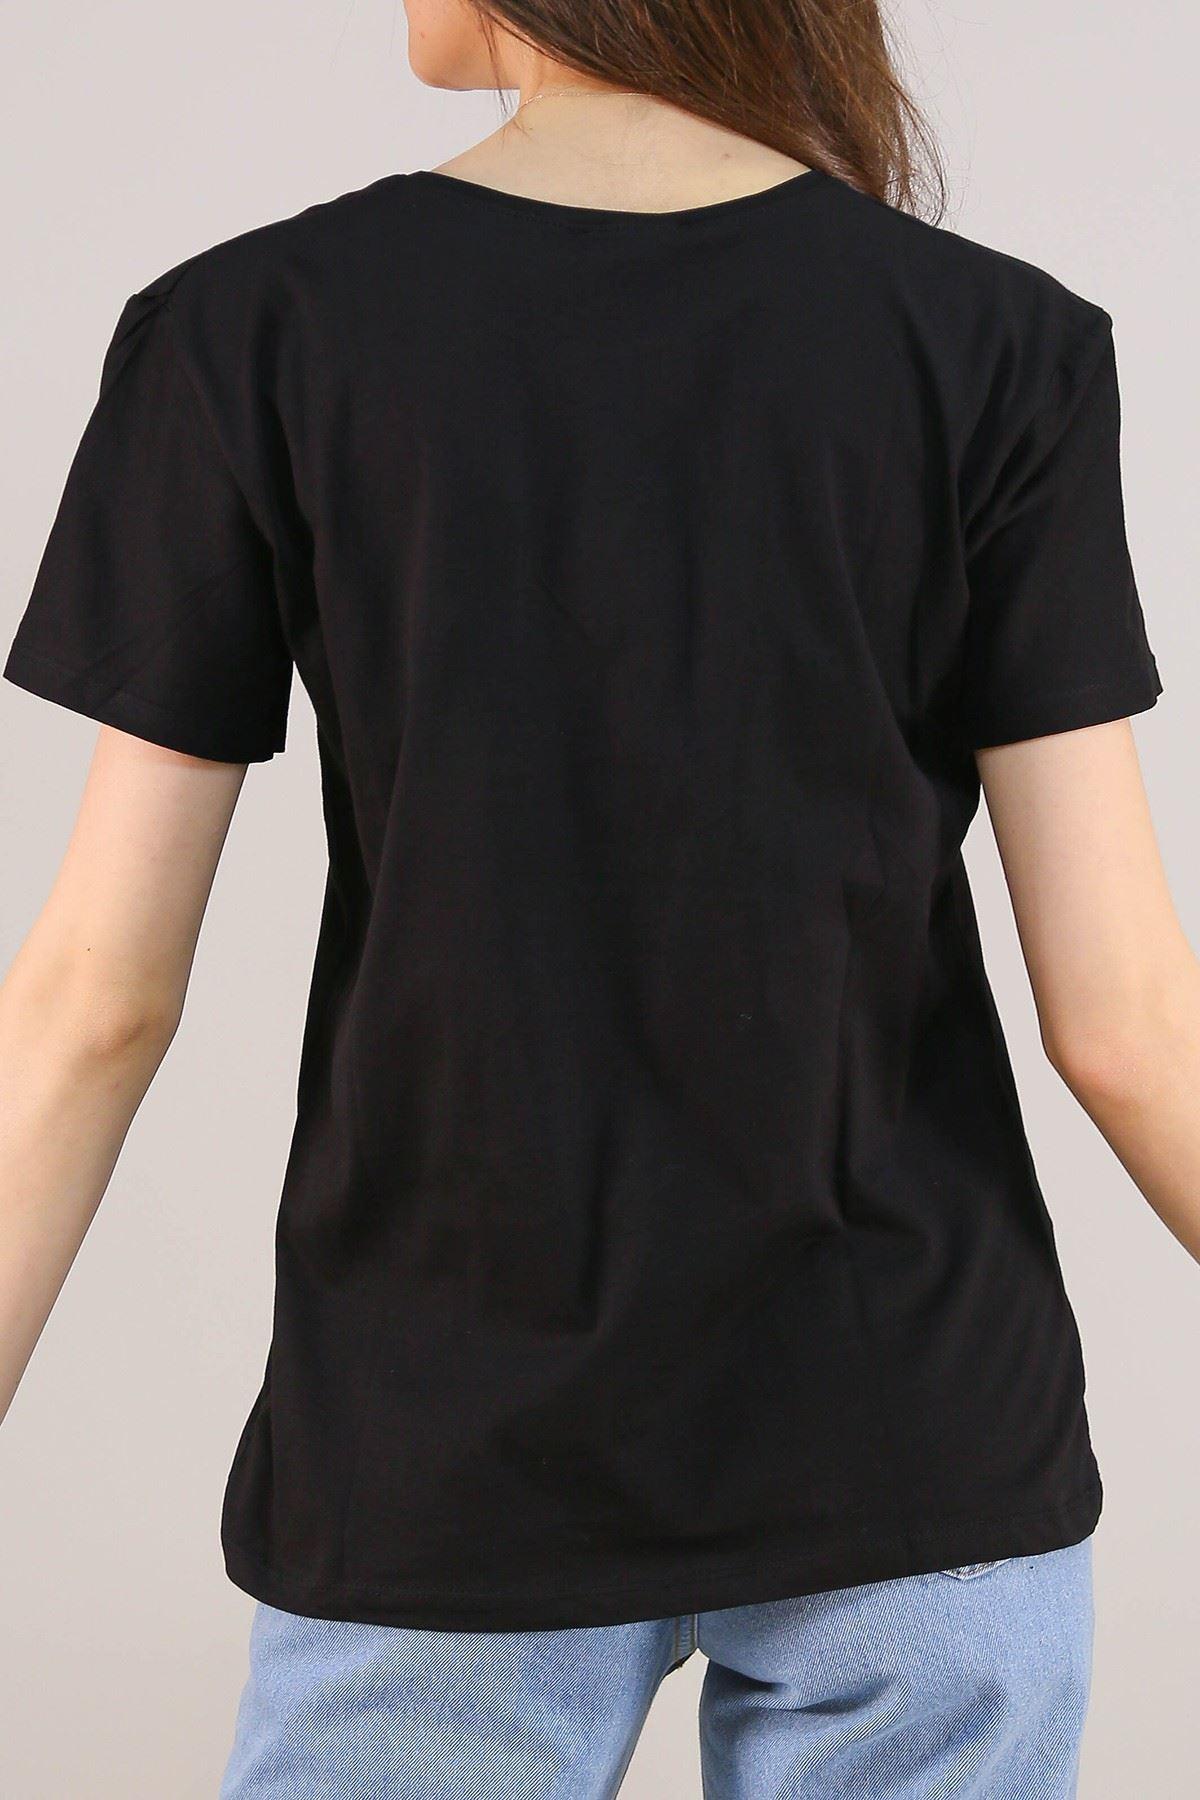 Nakışlı Tişört Siyah - 4997.336.